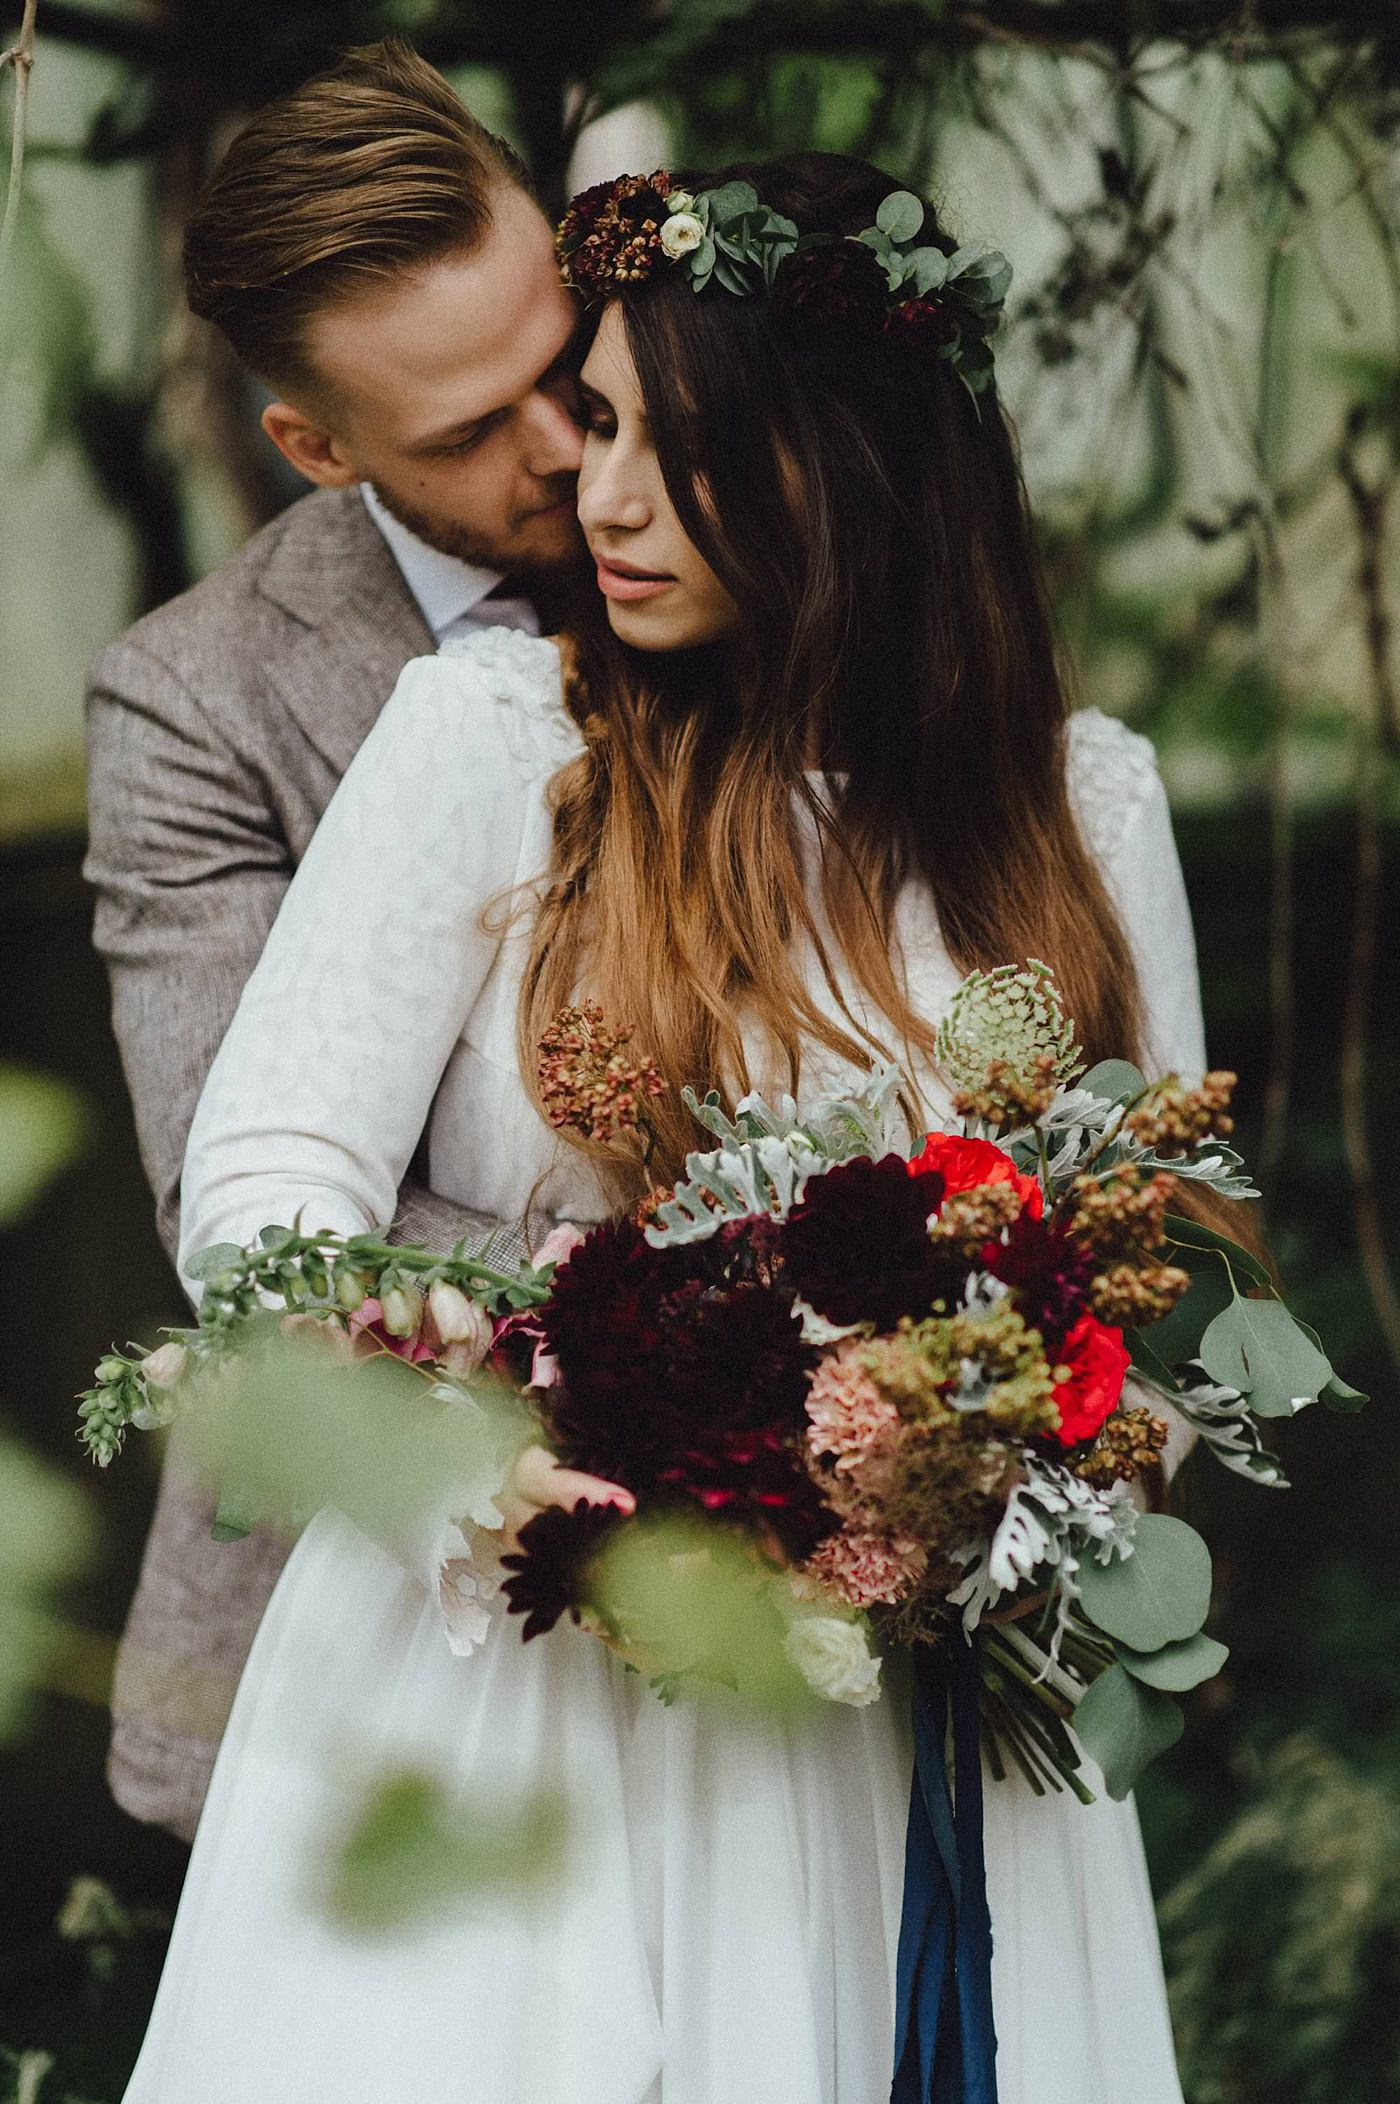 urban-elopement-wedding-197